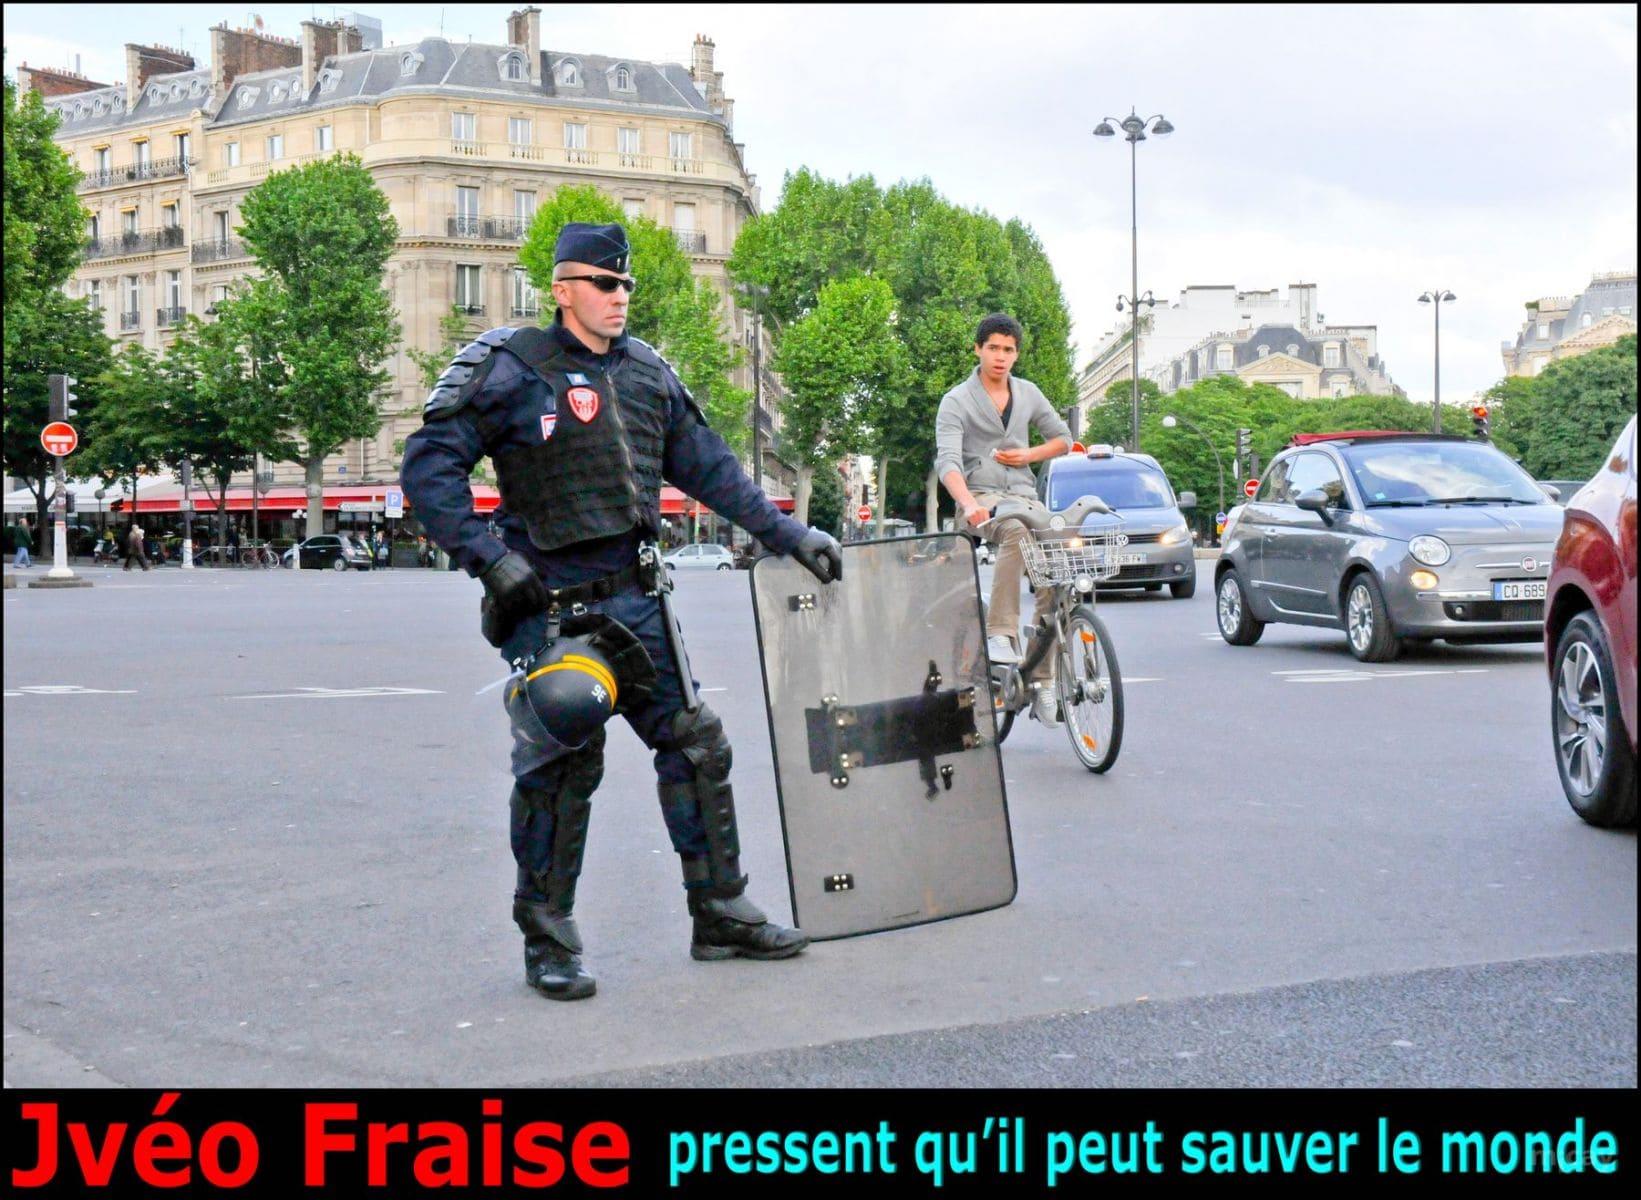 MichelAycaguer-JveoFraise-streetphotography-5